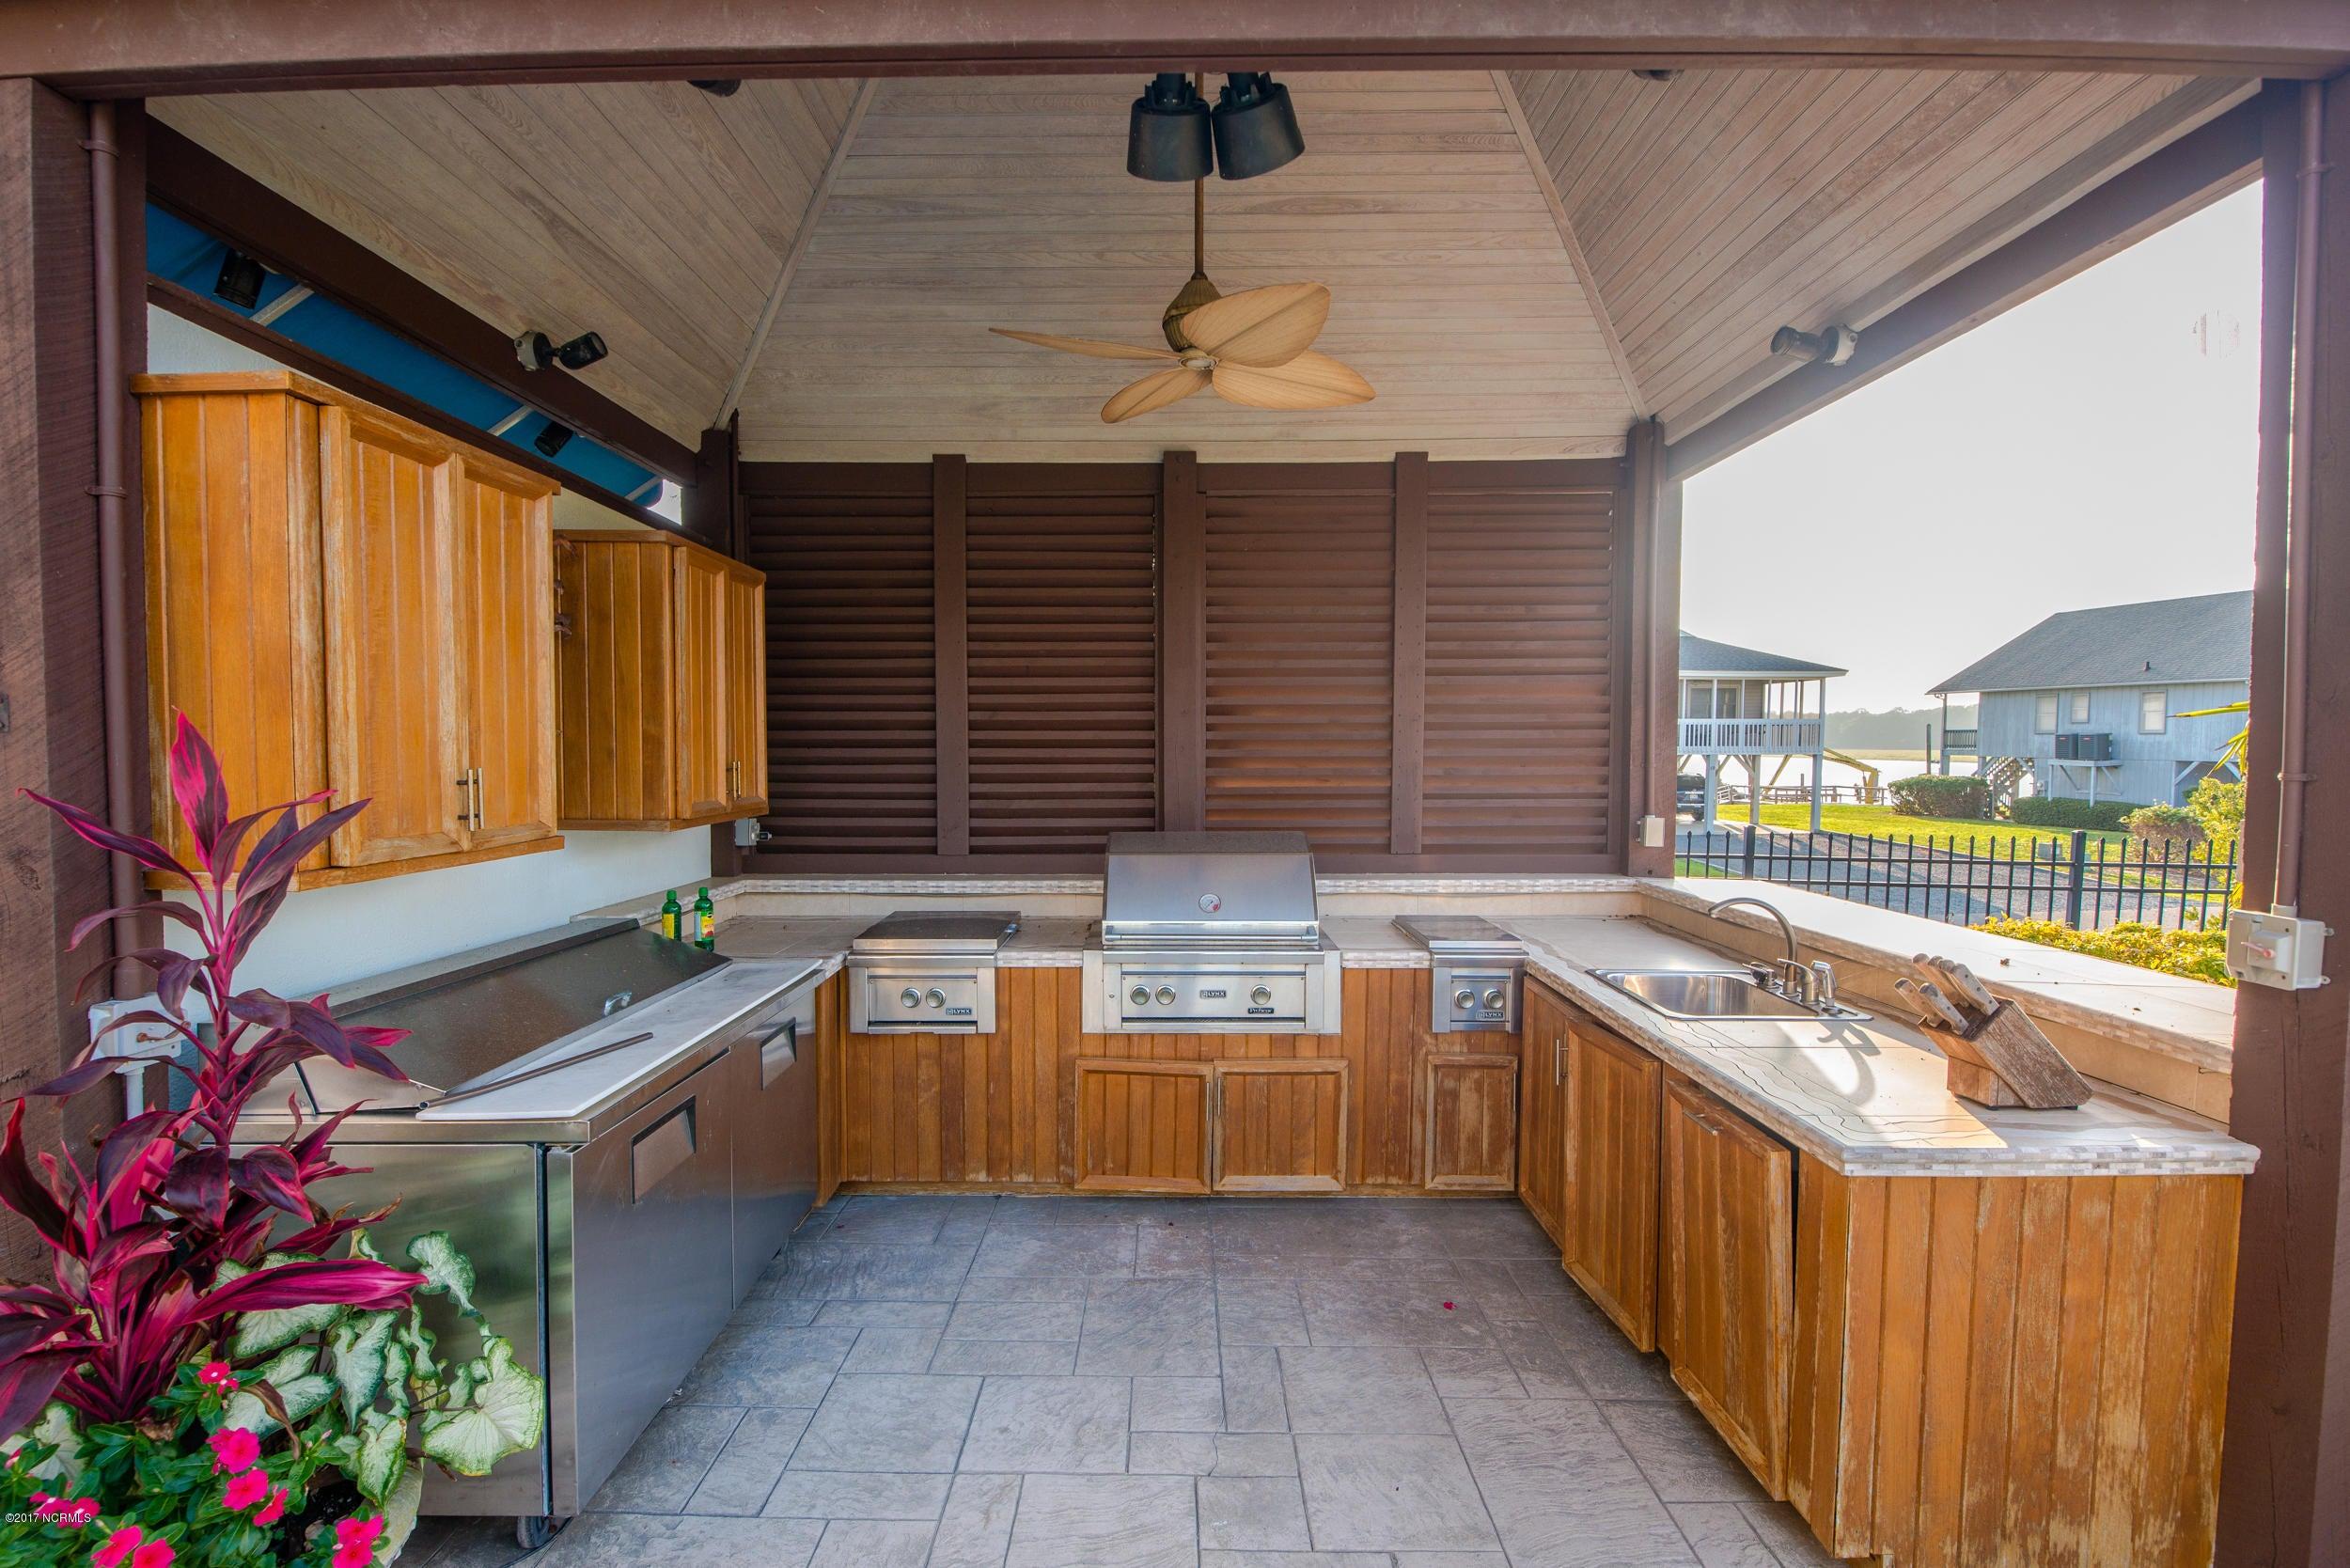 Ocean Isle Beach Real Estate - http://cdn.resize.sparkplatform.com/ncr/1024x768/true/20170829152148986753000000-o.jpg